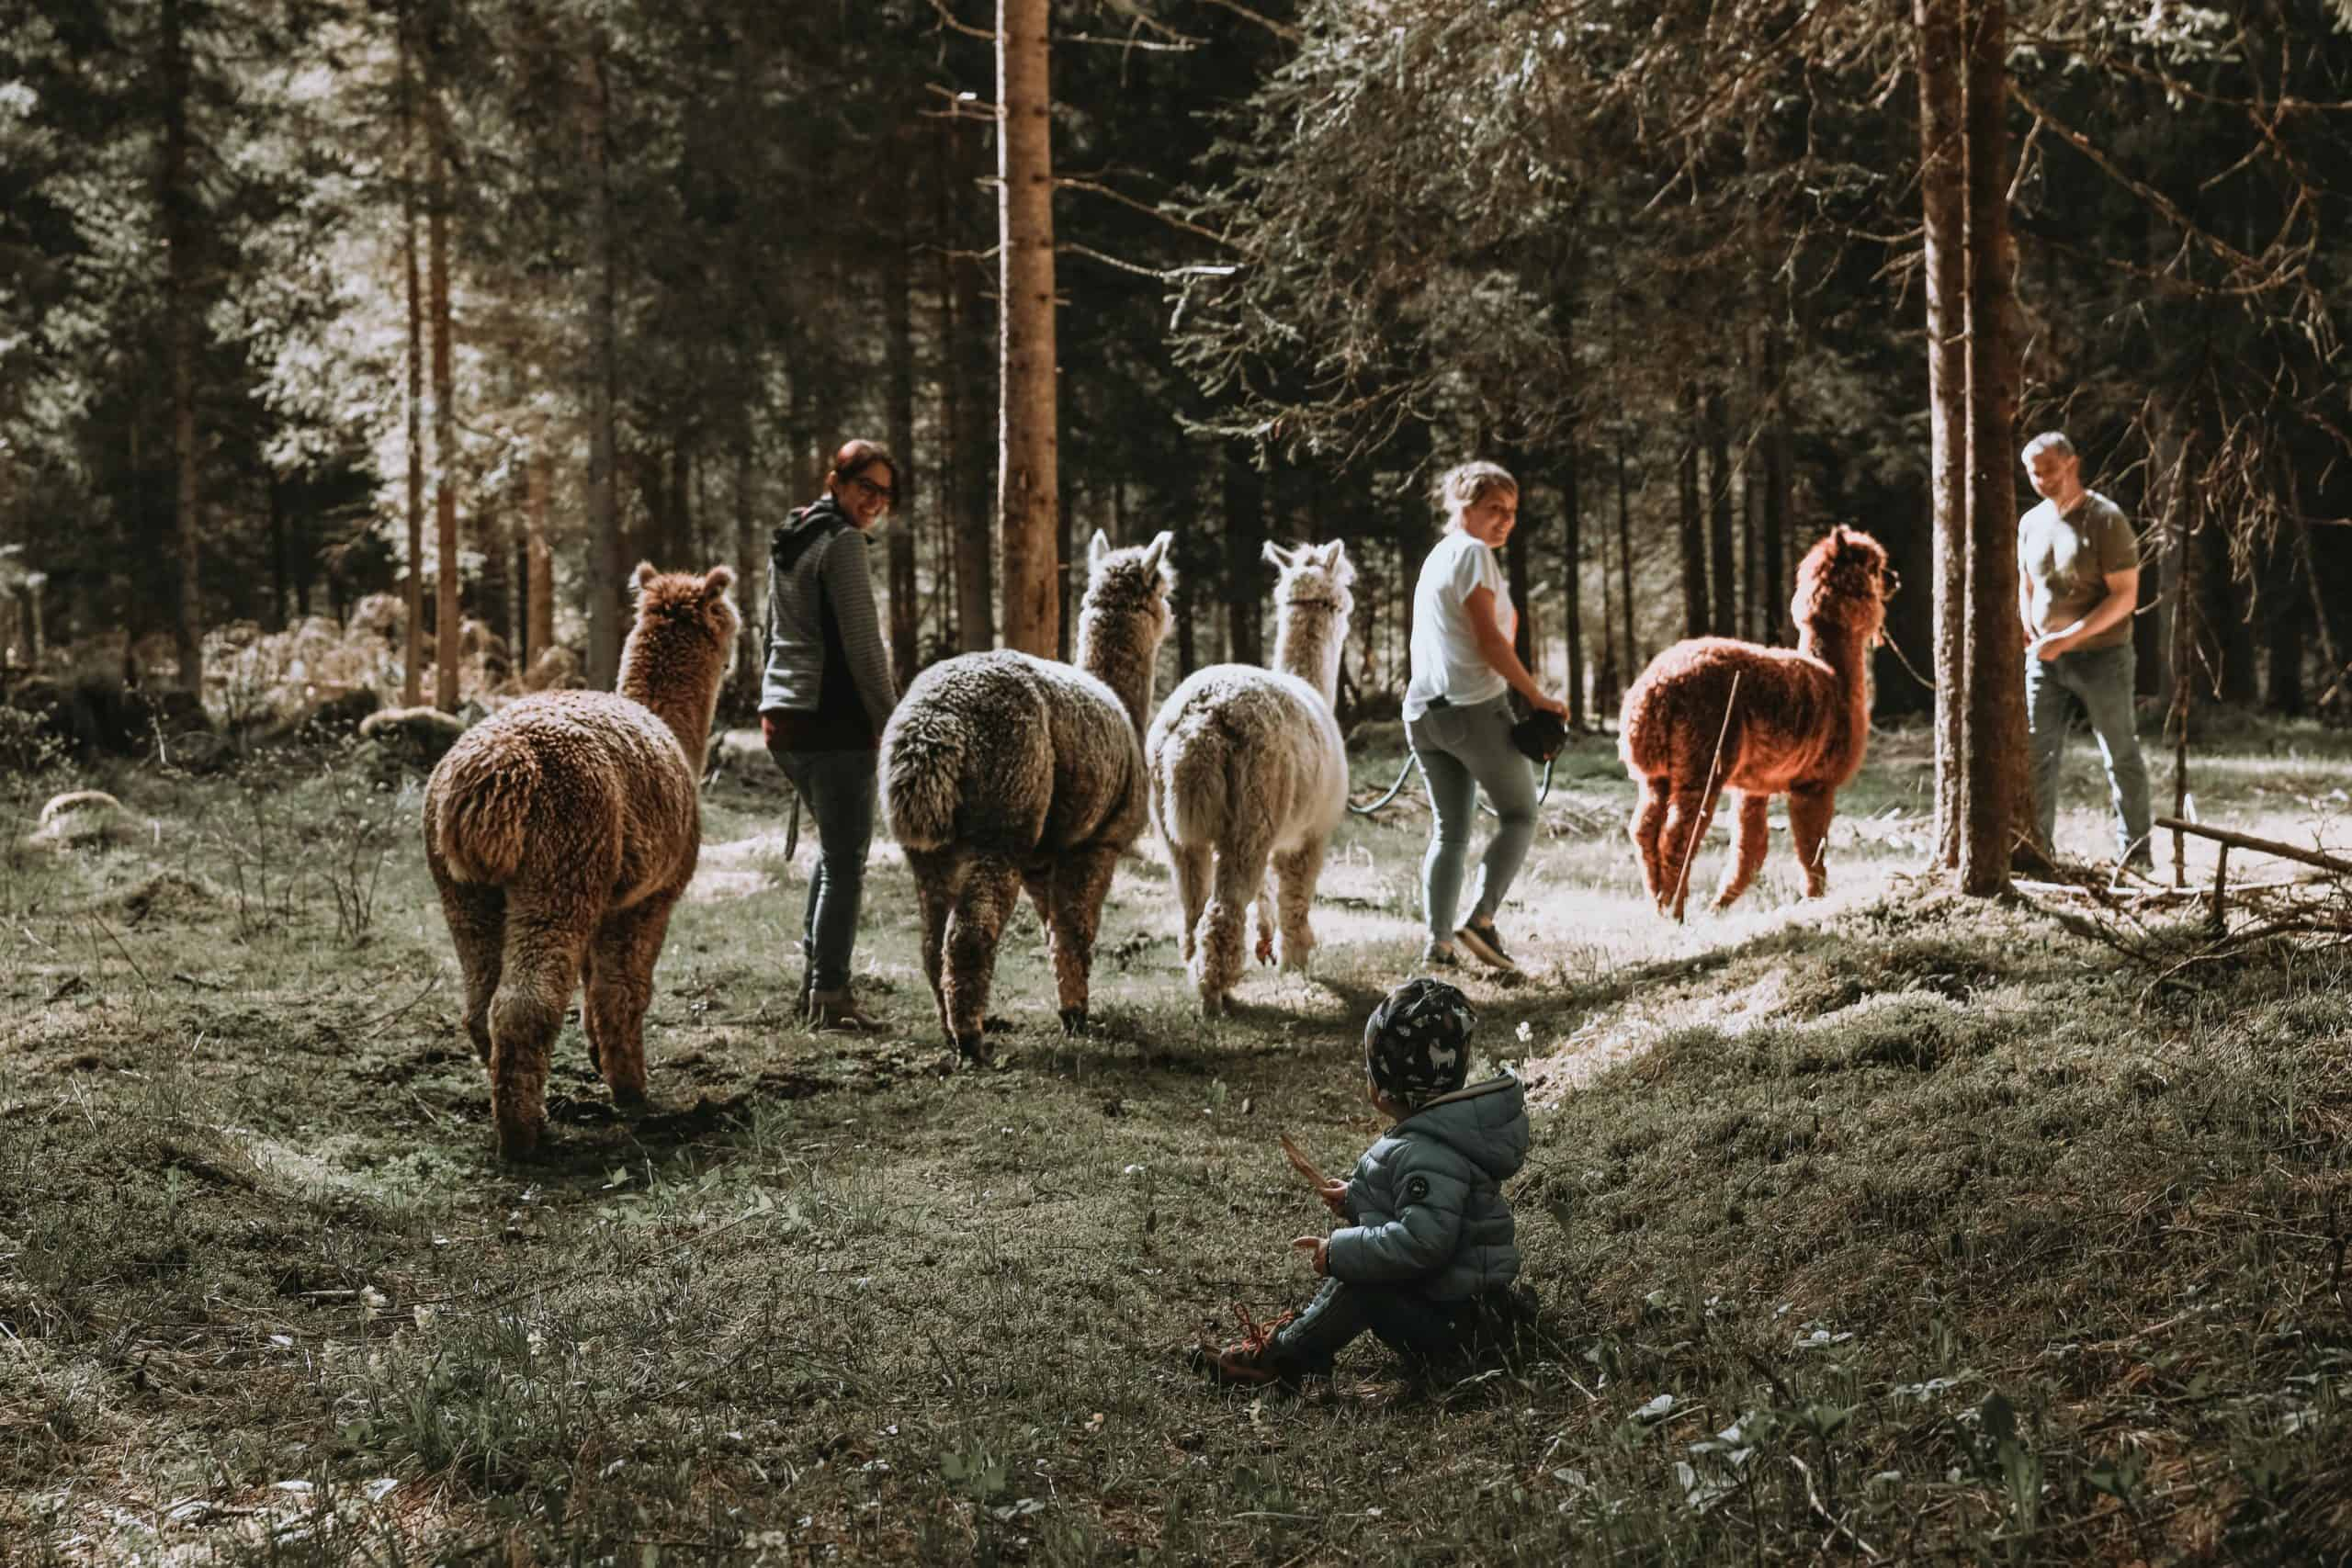 Gschnitzer_Alpaka-Alpakas-Wanderungen-Tirol-01-scaled unsere Herde